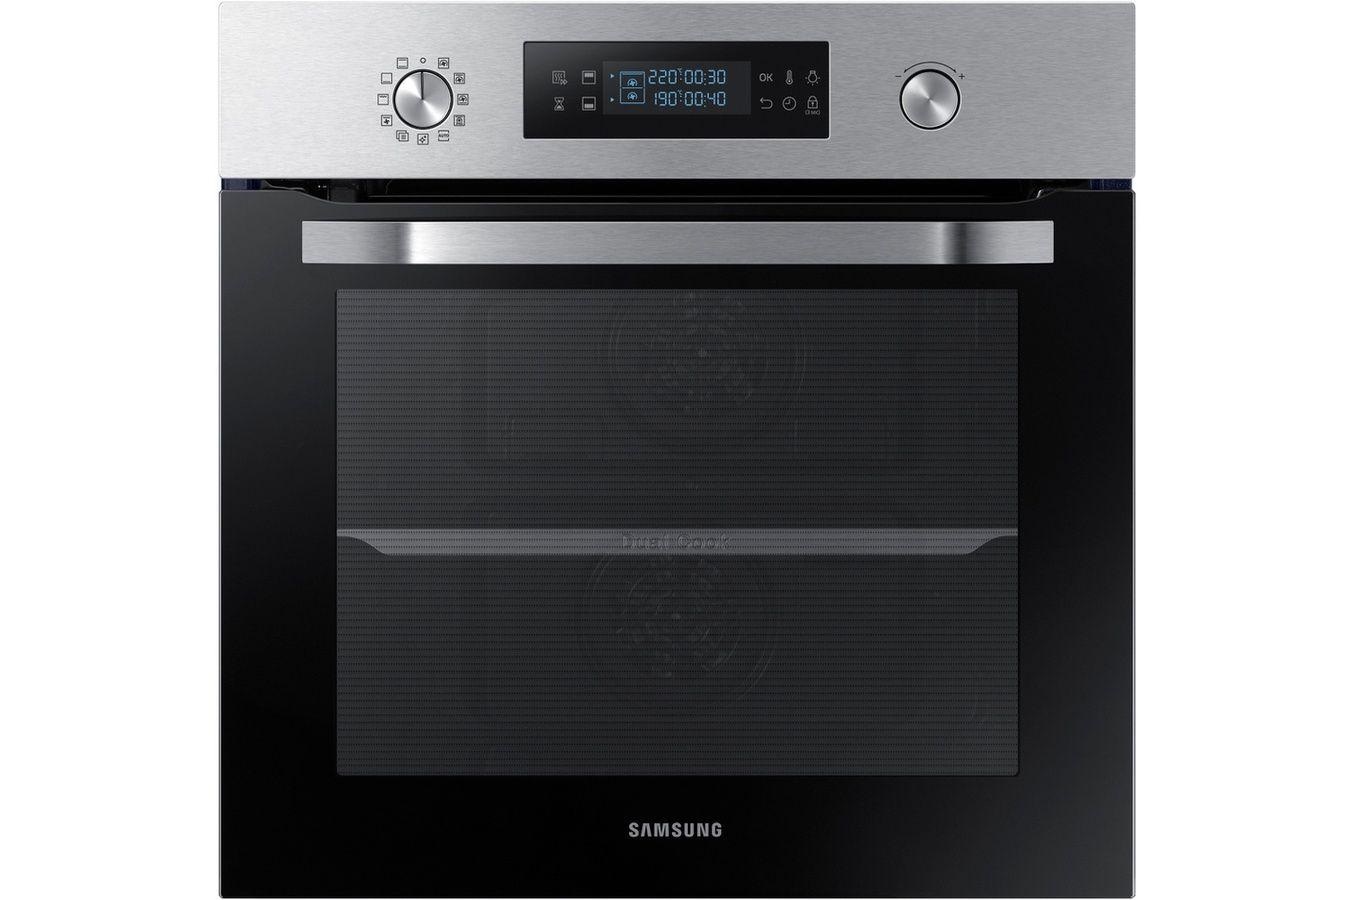 Four Encastrable Samsung Nv66m3571bs Kitchen Appliances Chartres Samsung